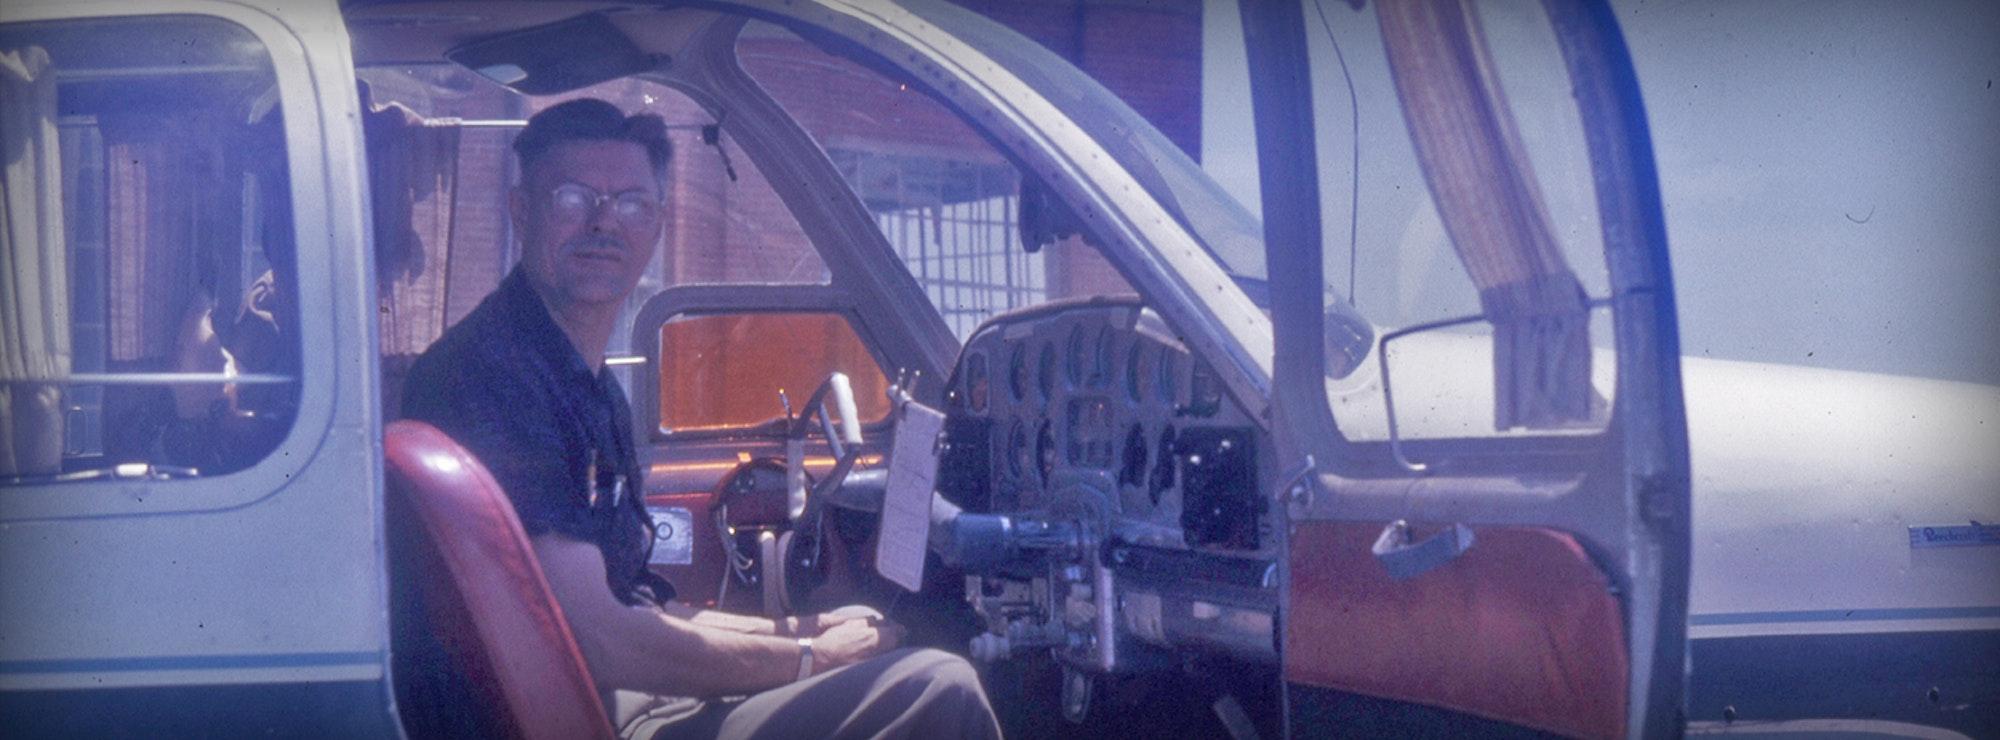 PWK in a plane cockpit